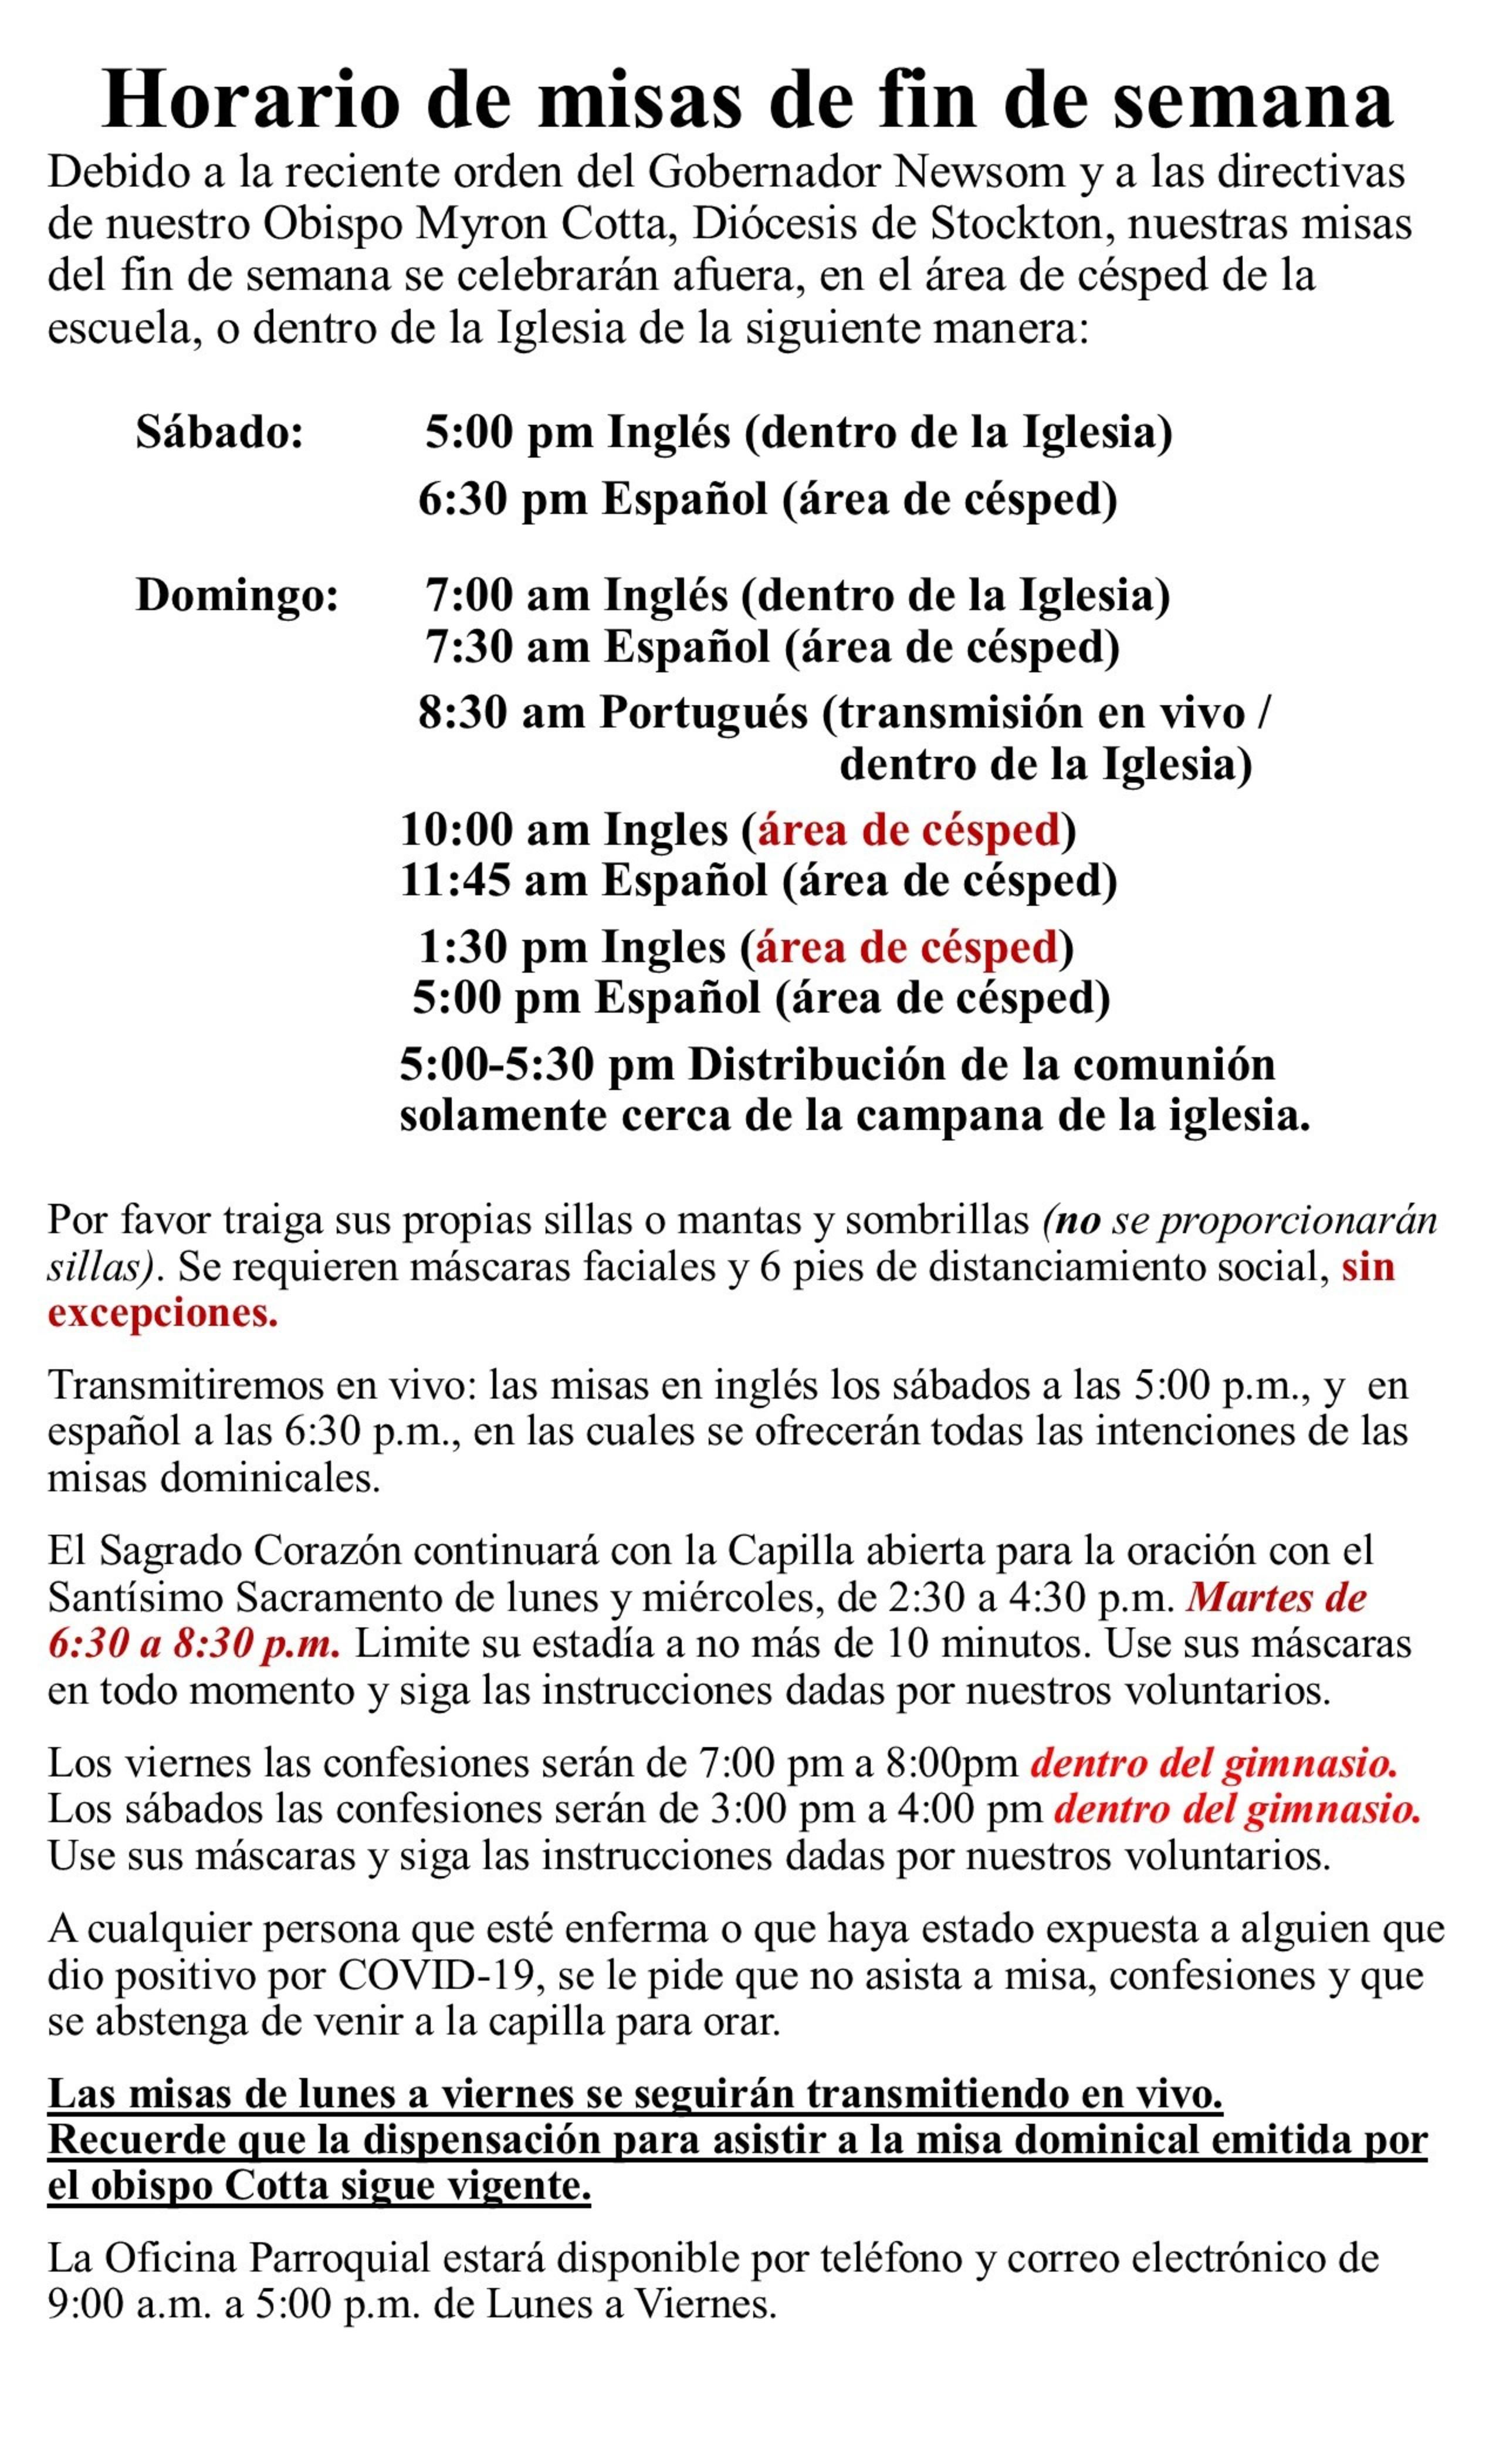 Spanish Directives April 2021